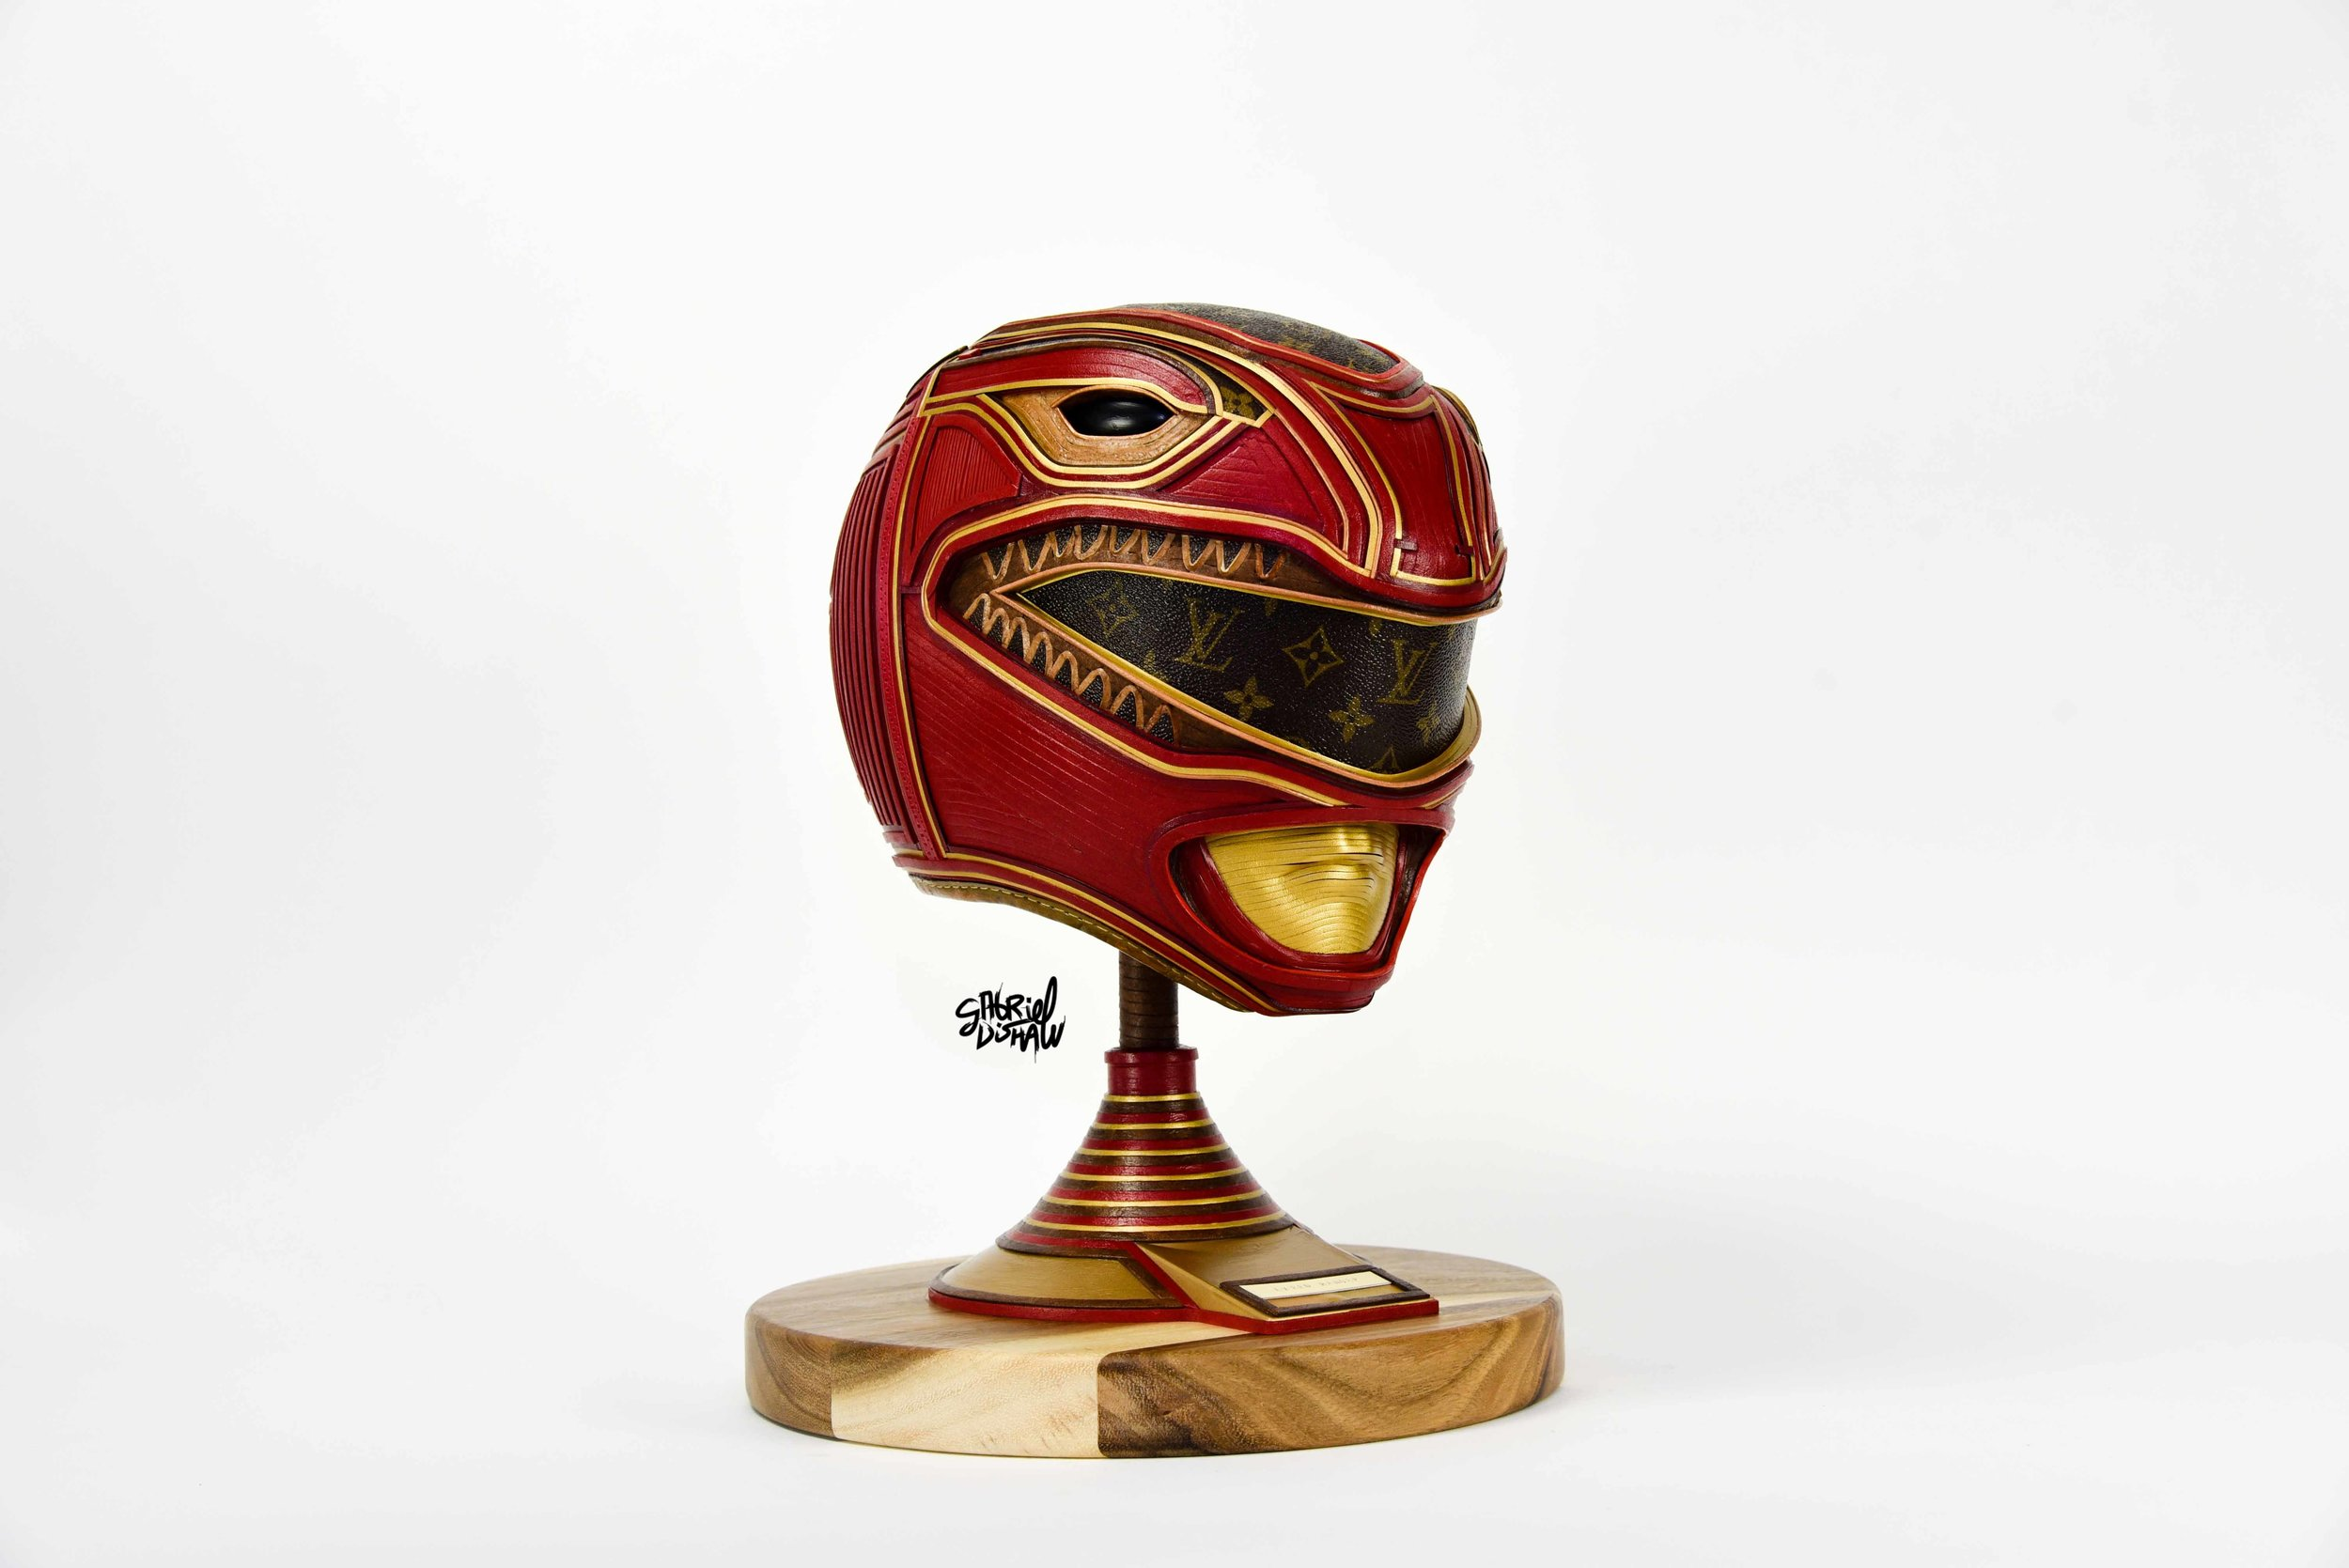 Gabriel Dishaw LV Red Ranger-3290.jpg